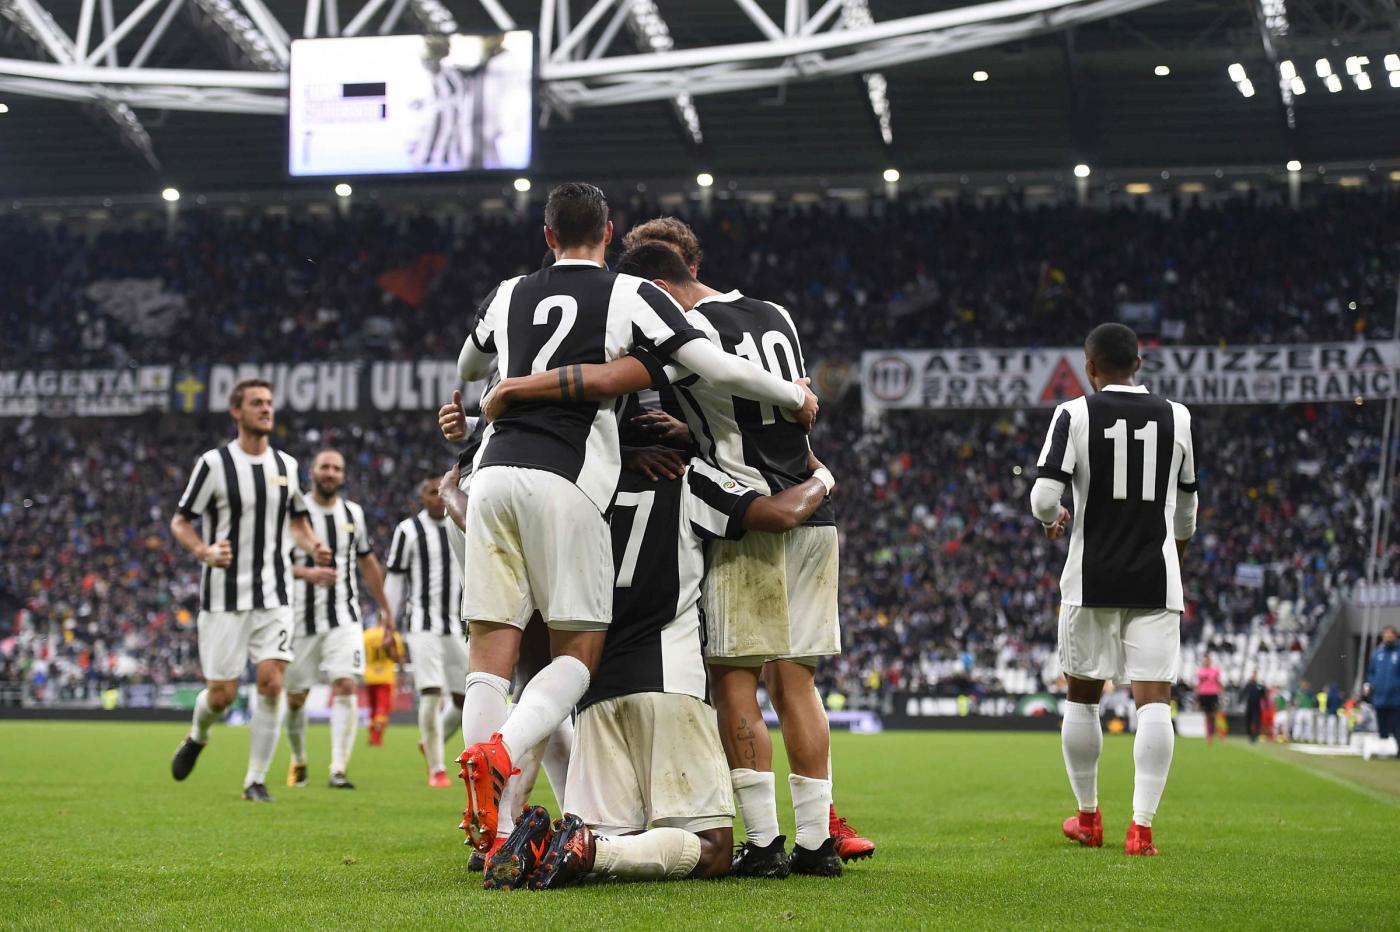 Serie A. Vincono Juve e Milan, stop per Inter e Napoli